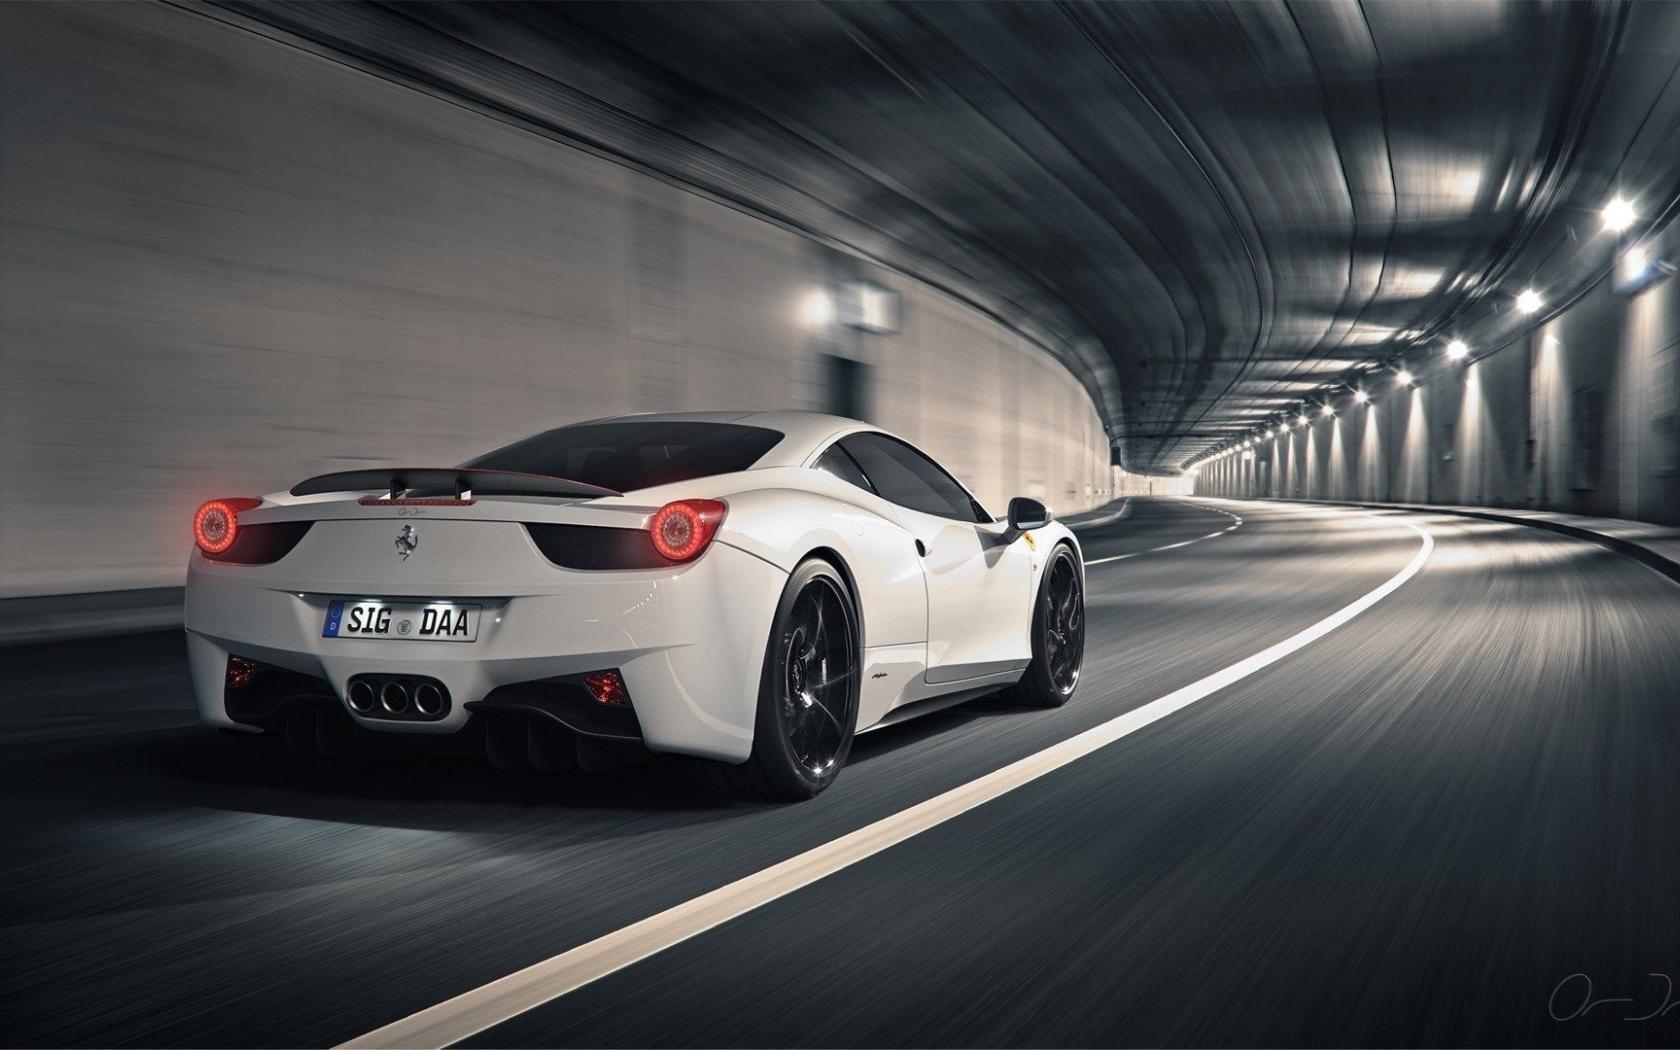 Free Download Black Ferrari Wallpaper Widescreen At Cars Monodomo